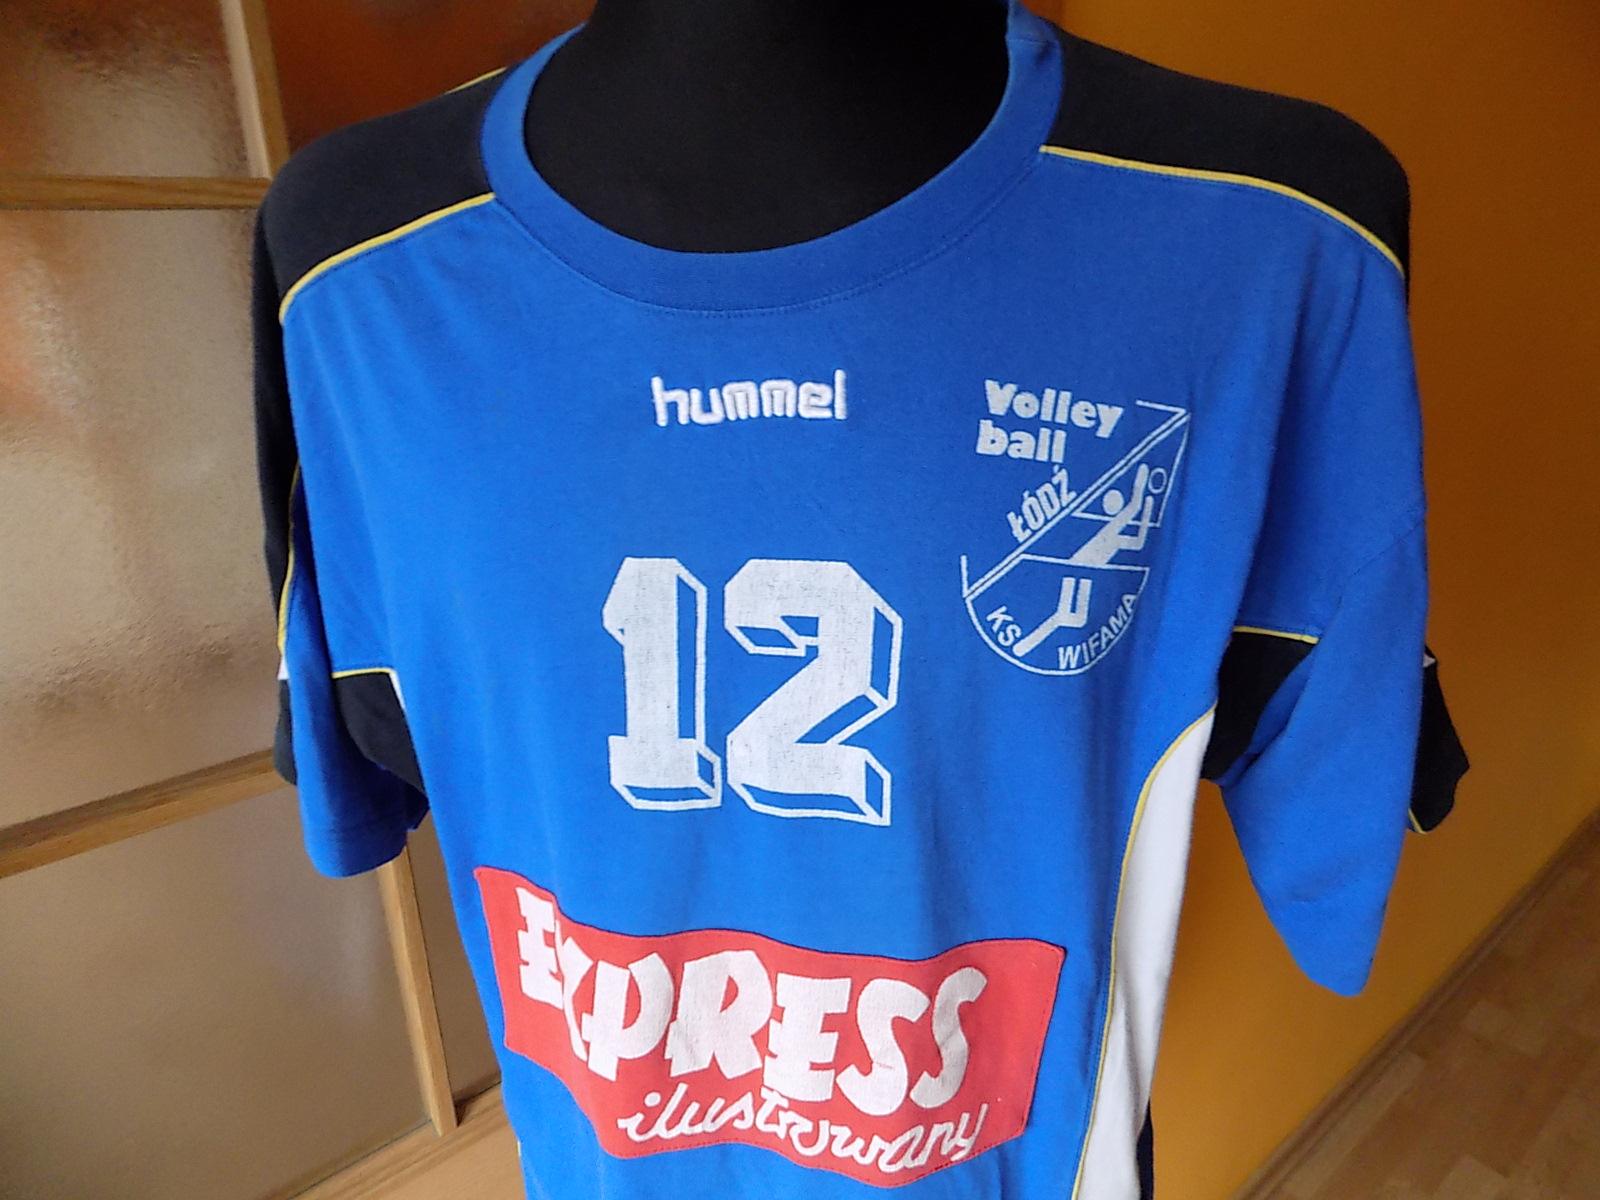 Hummel Wifama Łódź koszulka XL volleyball retro